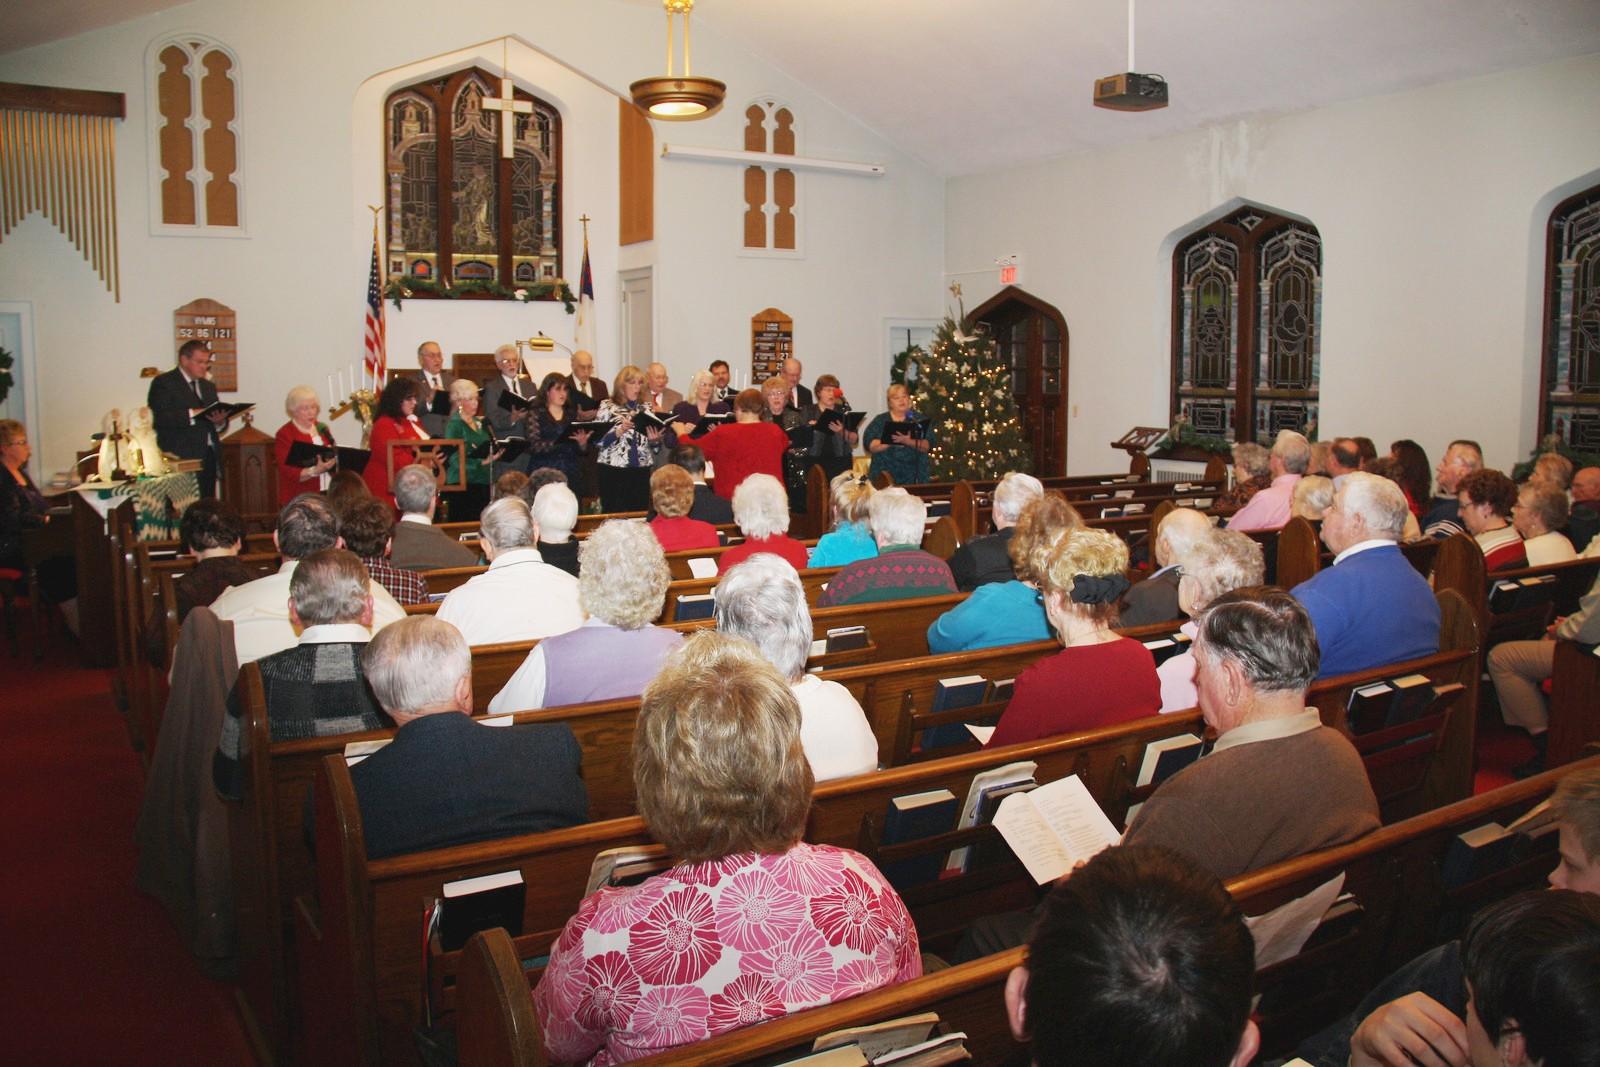 FIVE YEARS AGO: Hope Has Hands Musical held in Lewistown Valley